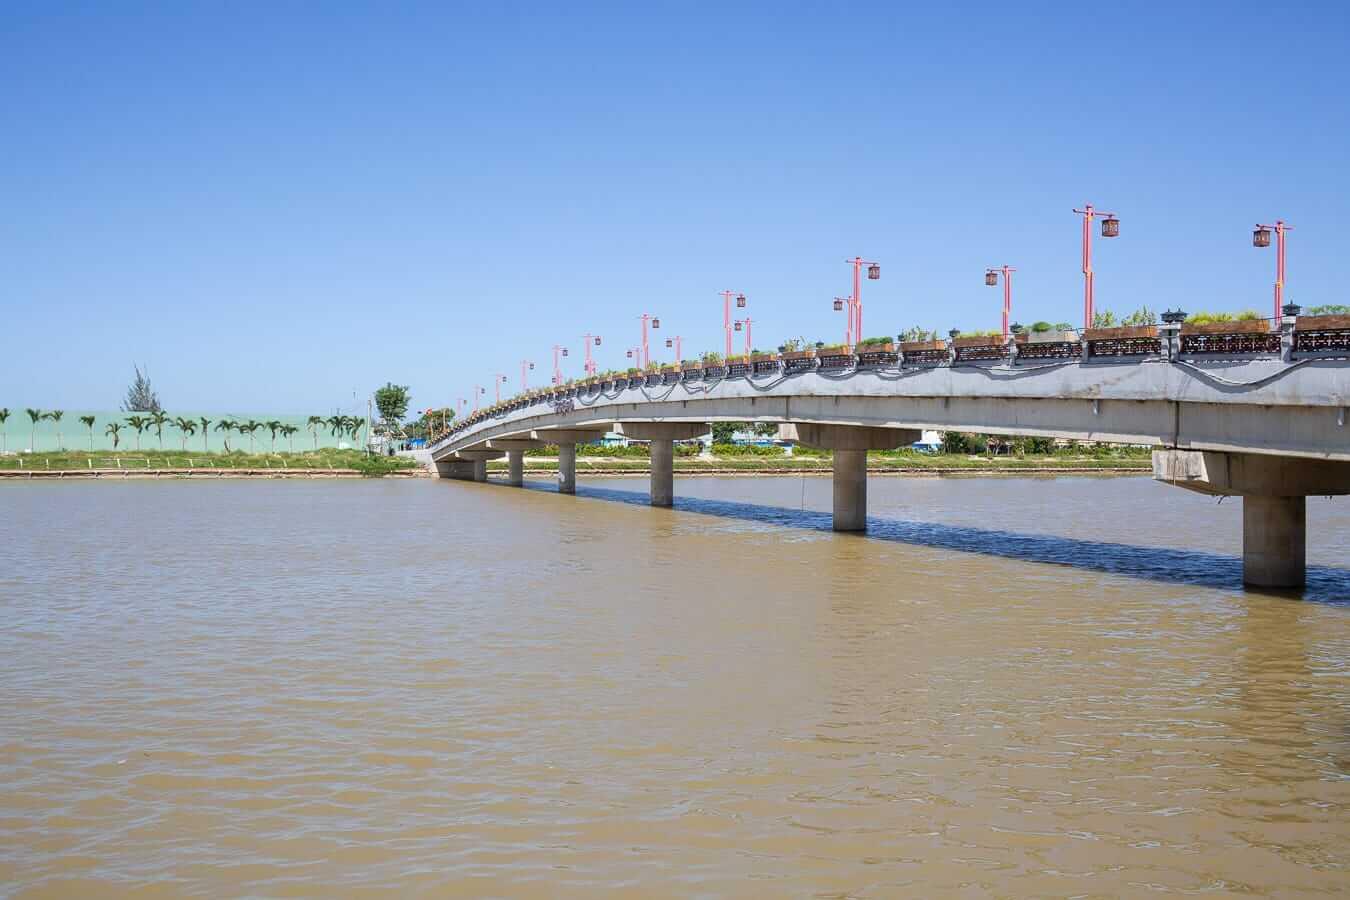 Impressions Island bridge